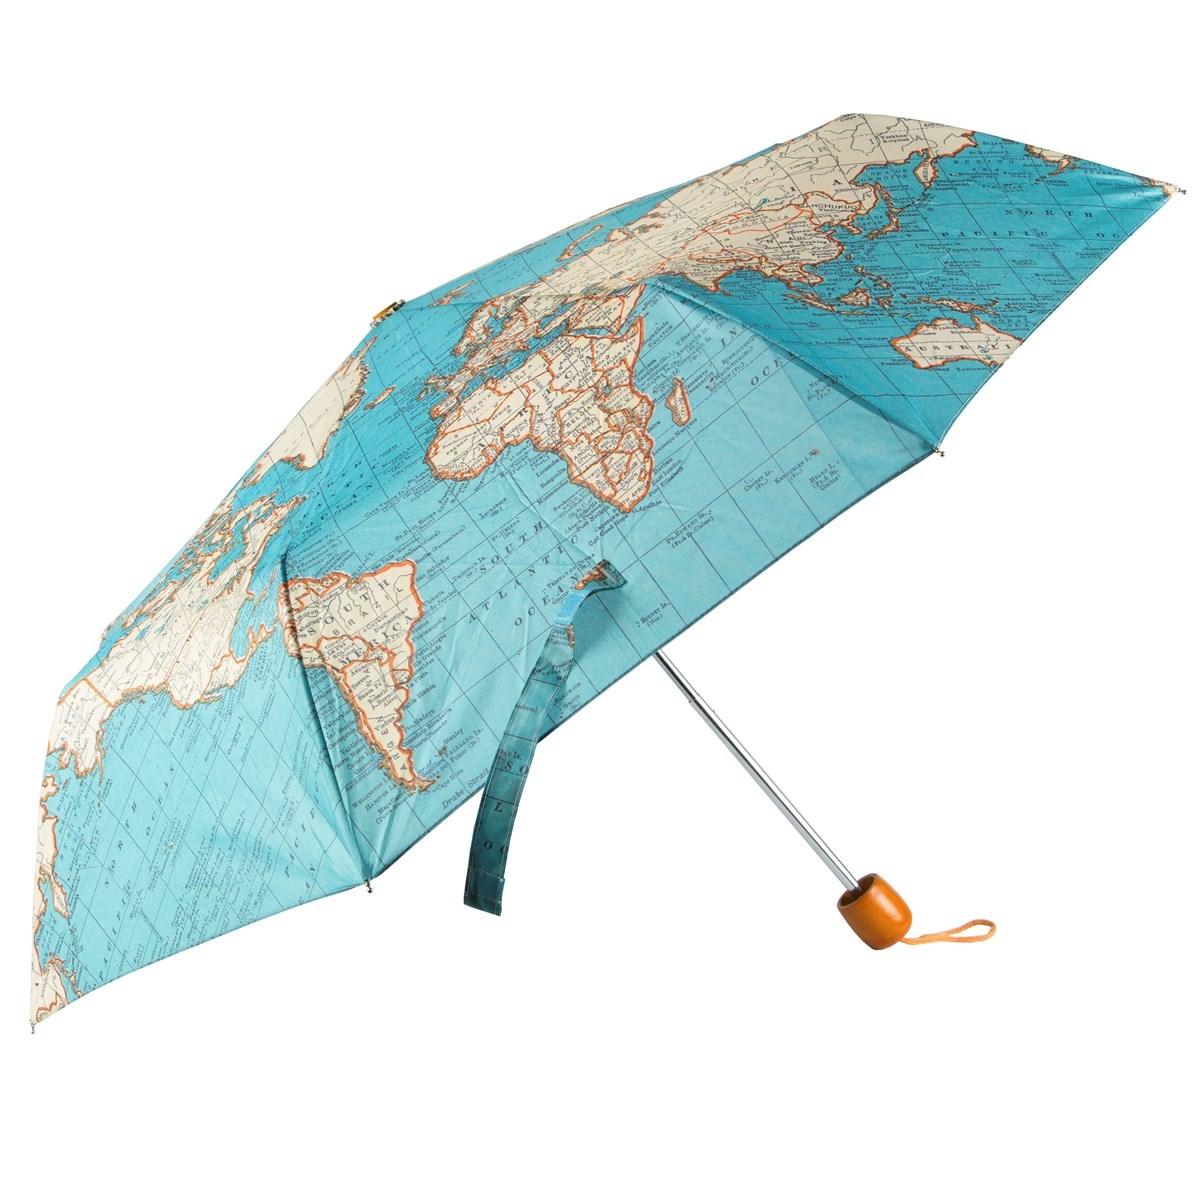 Vintage map folding umbrella vintage map folding umbrella default image gumiabroncs Images